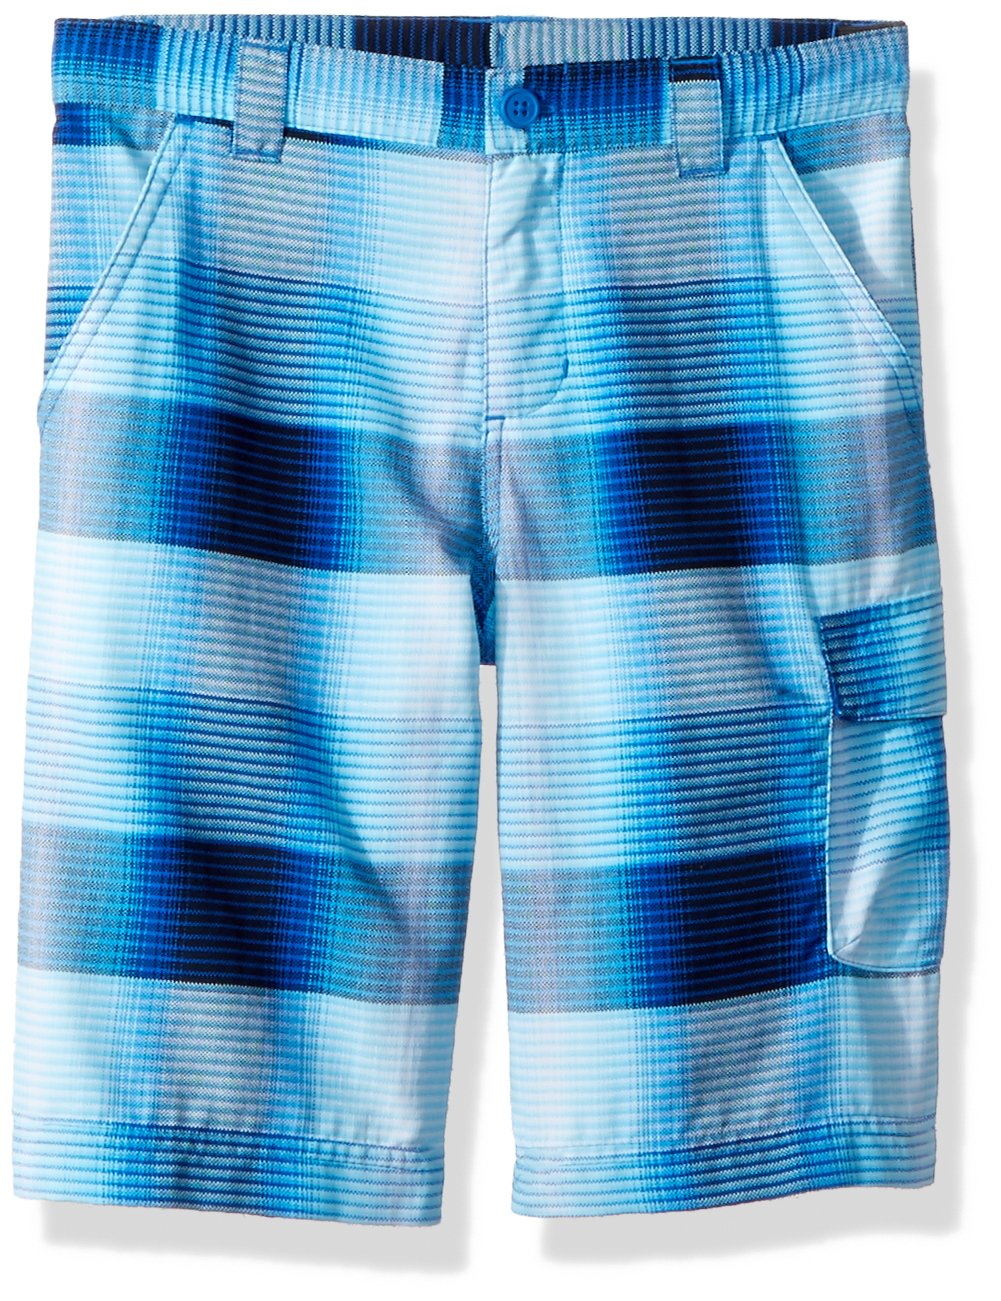 Columbia Boys Silver Ridge Printed Shorts, Super Blue Plaid, Small